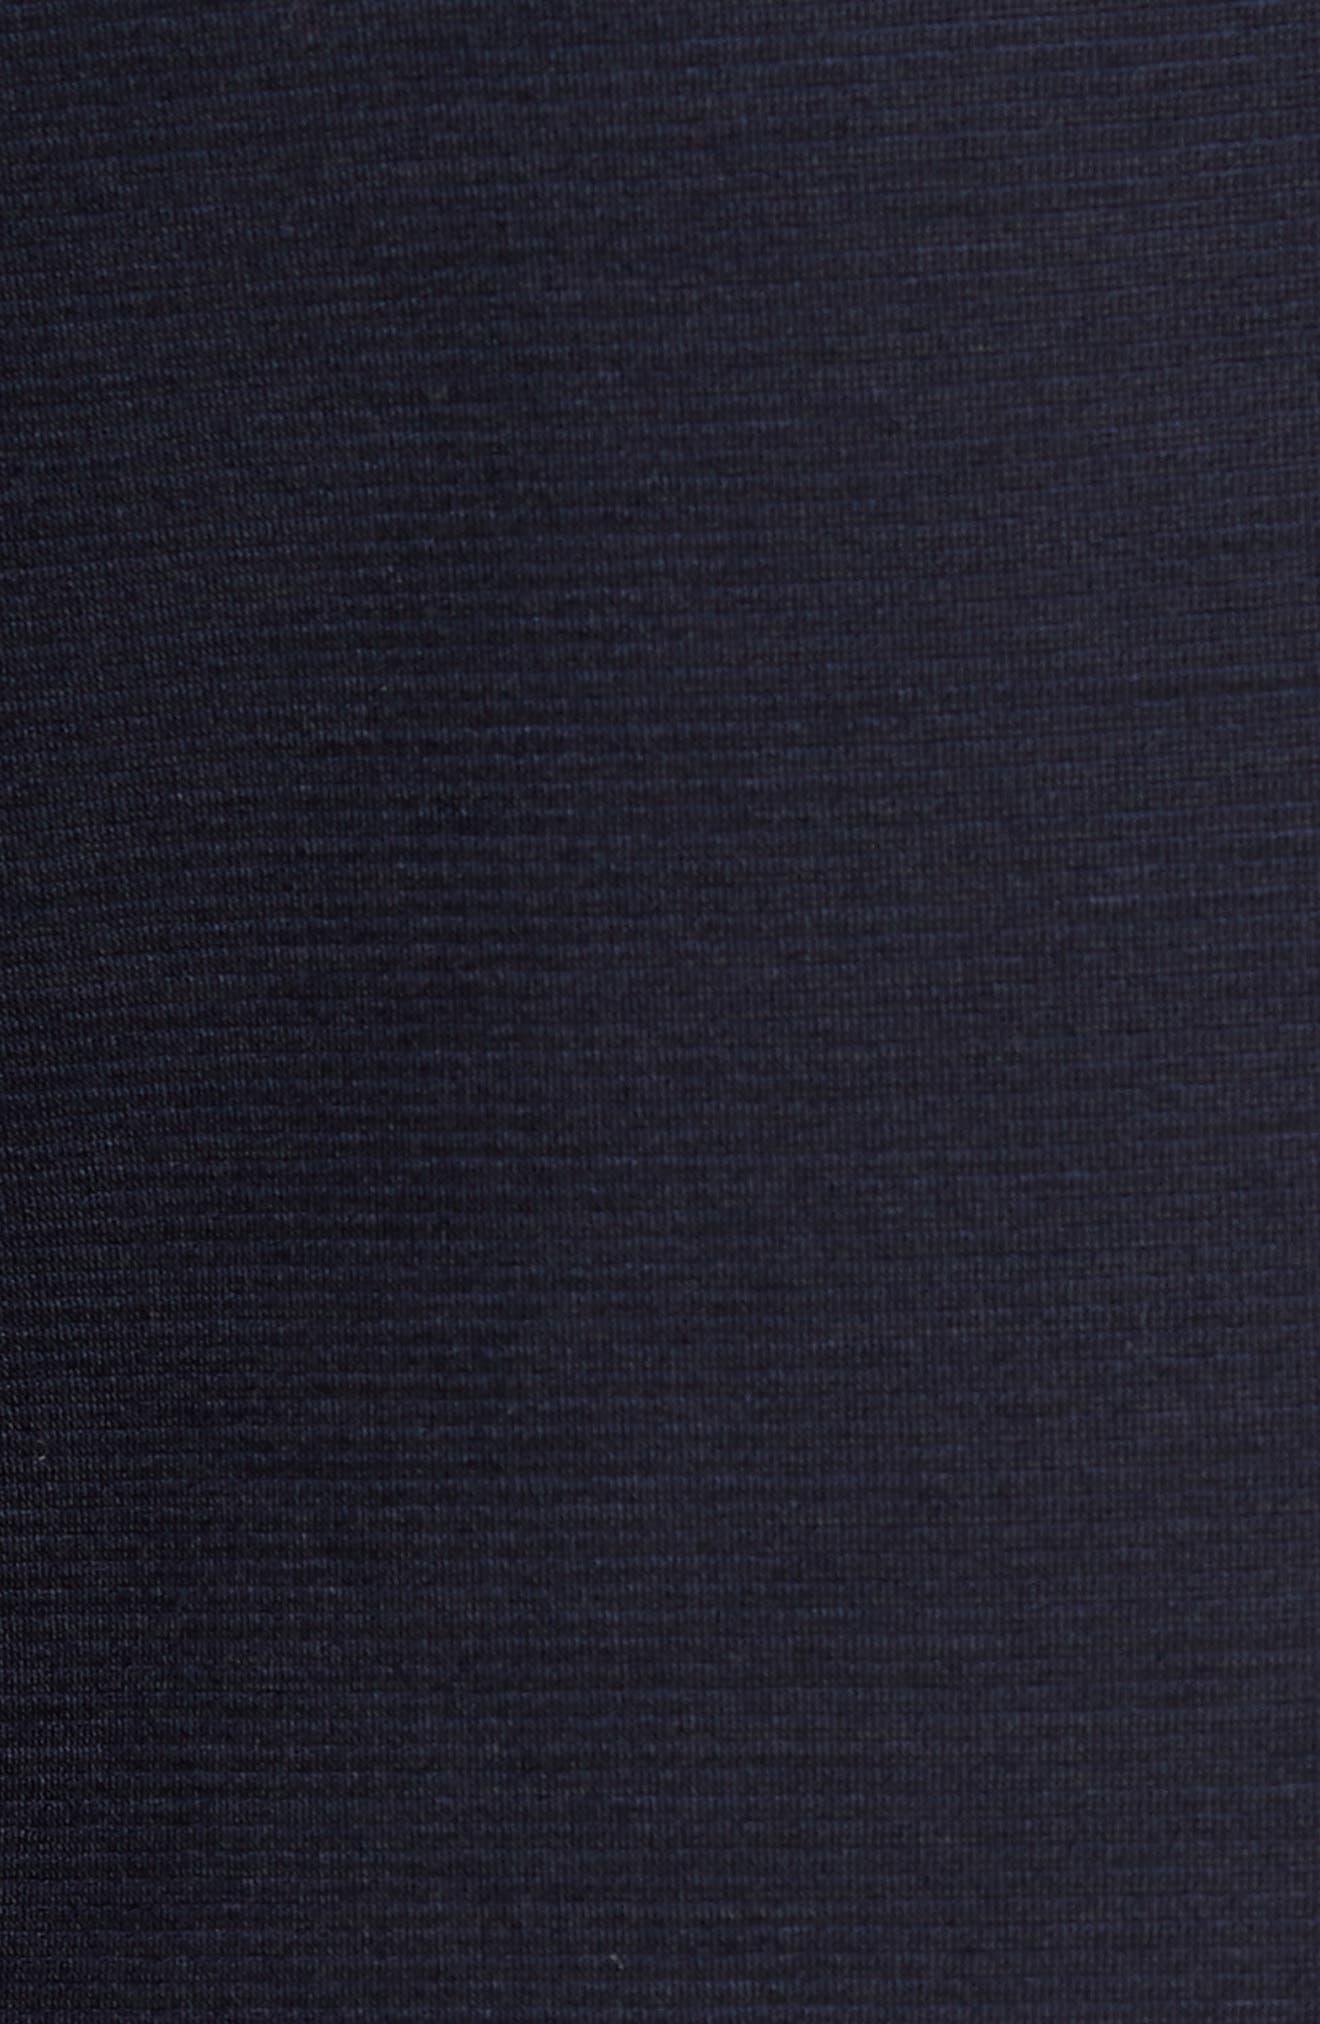 Cardrona Slim Fit Wool Blend Blazer,                             Alternate thumbnail 5, color,                             Navy